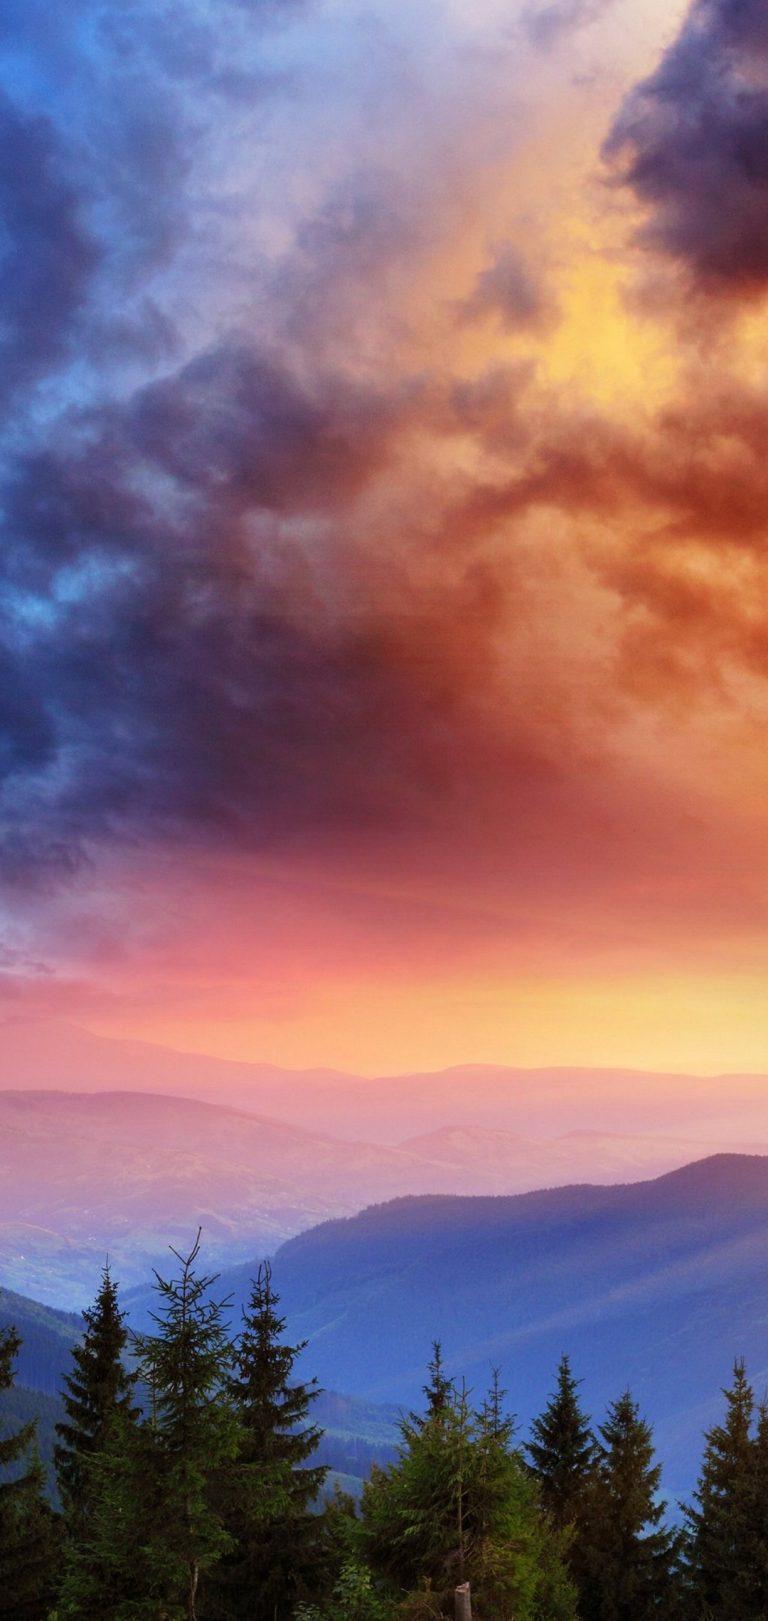 Valley Morning Wallpaper 1080x2280 768x1621